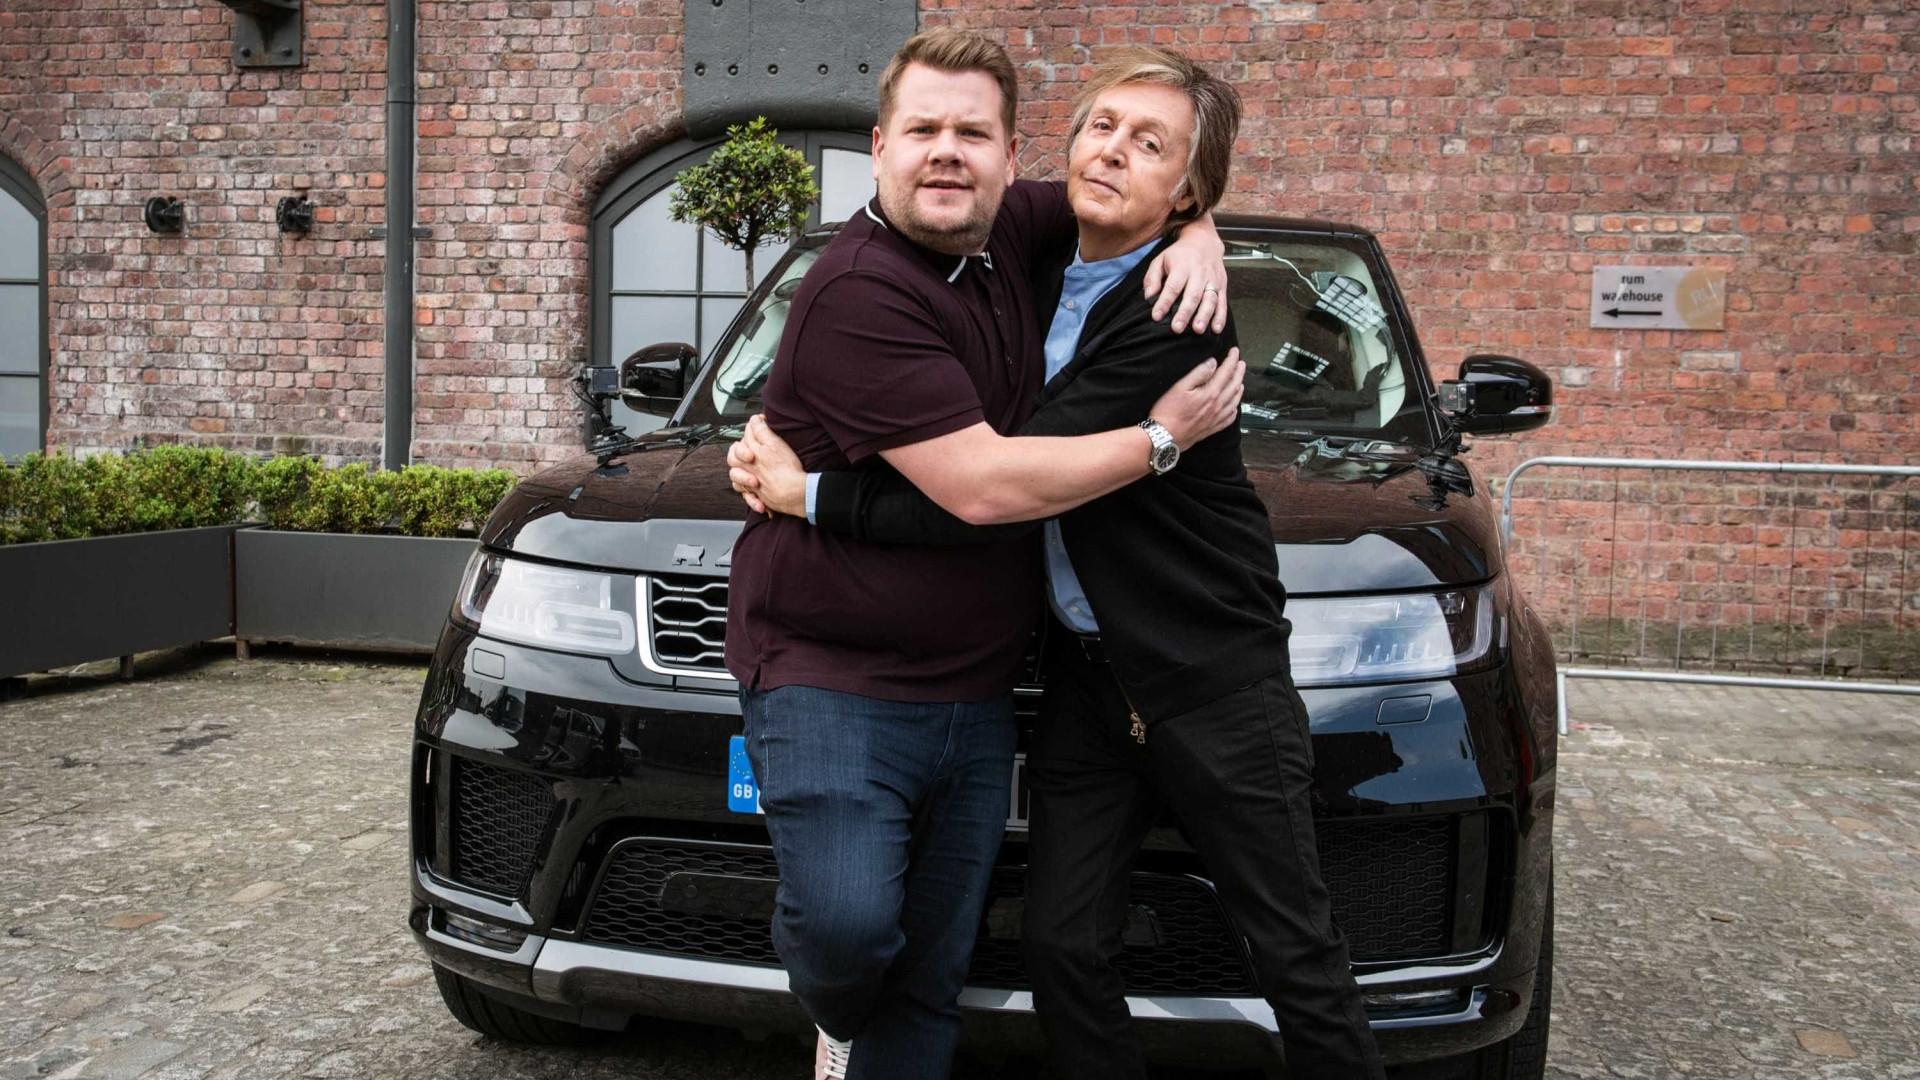 Paul McCartney faz show surpresa no 'Carpool Karaoke'; veja